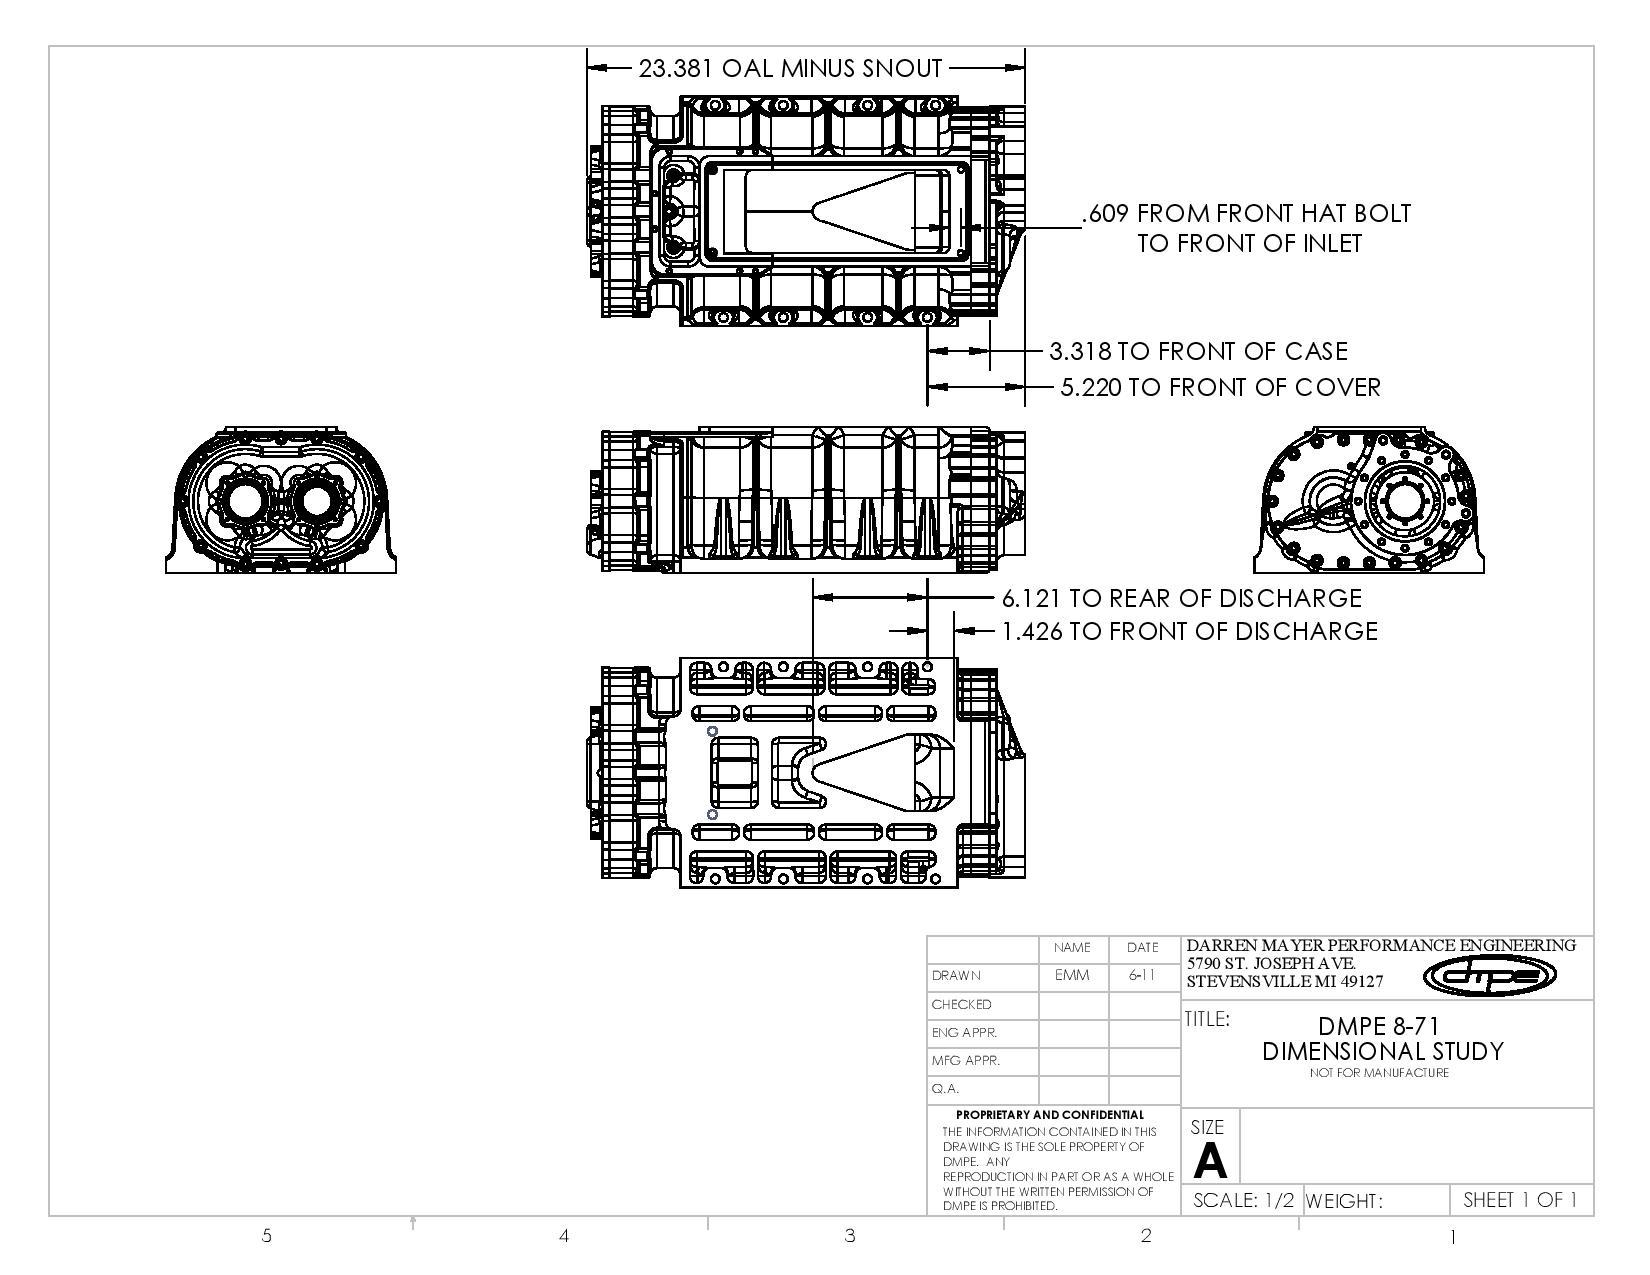 m4-8-71-basic-dimensional-info-page-001.jpg